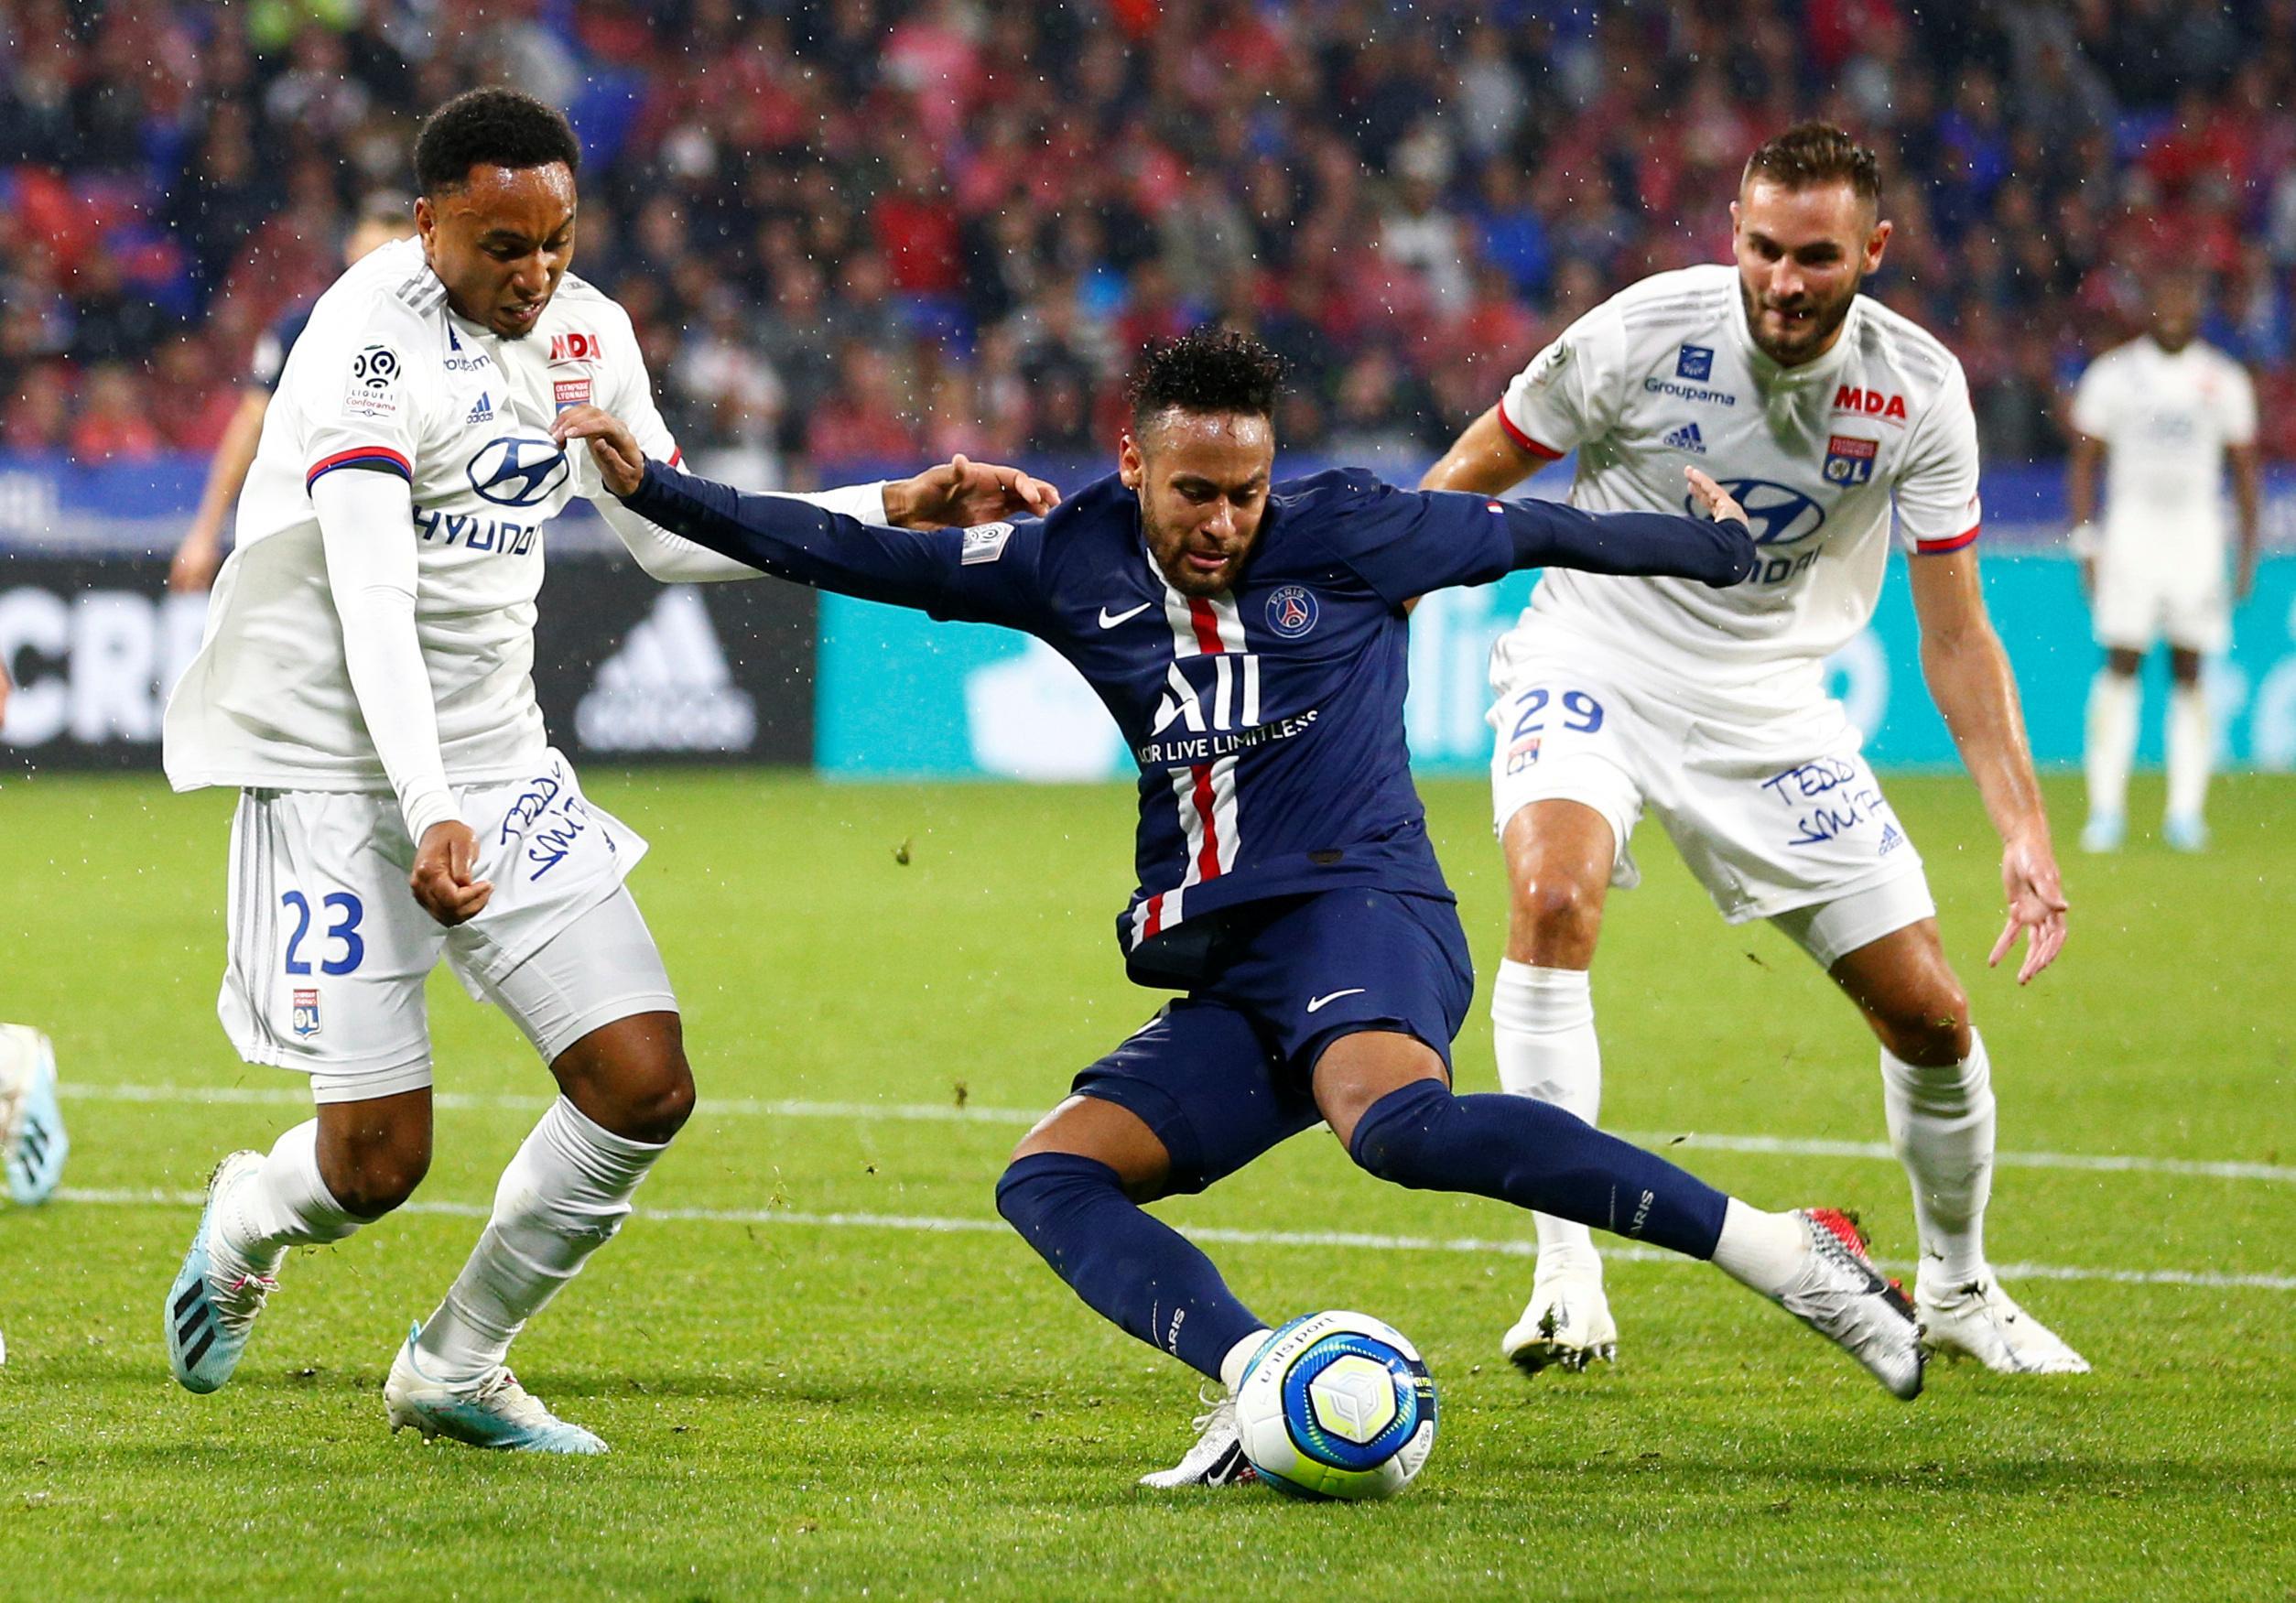 Neymar to the rescue again as PSG beat Lyon